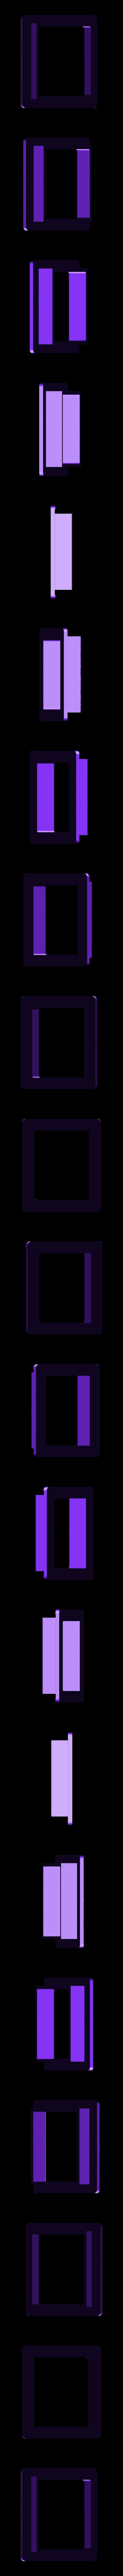 corner_lock_part2.stl Download free STL file Door Handles • Object to 3D print, Job